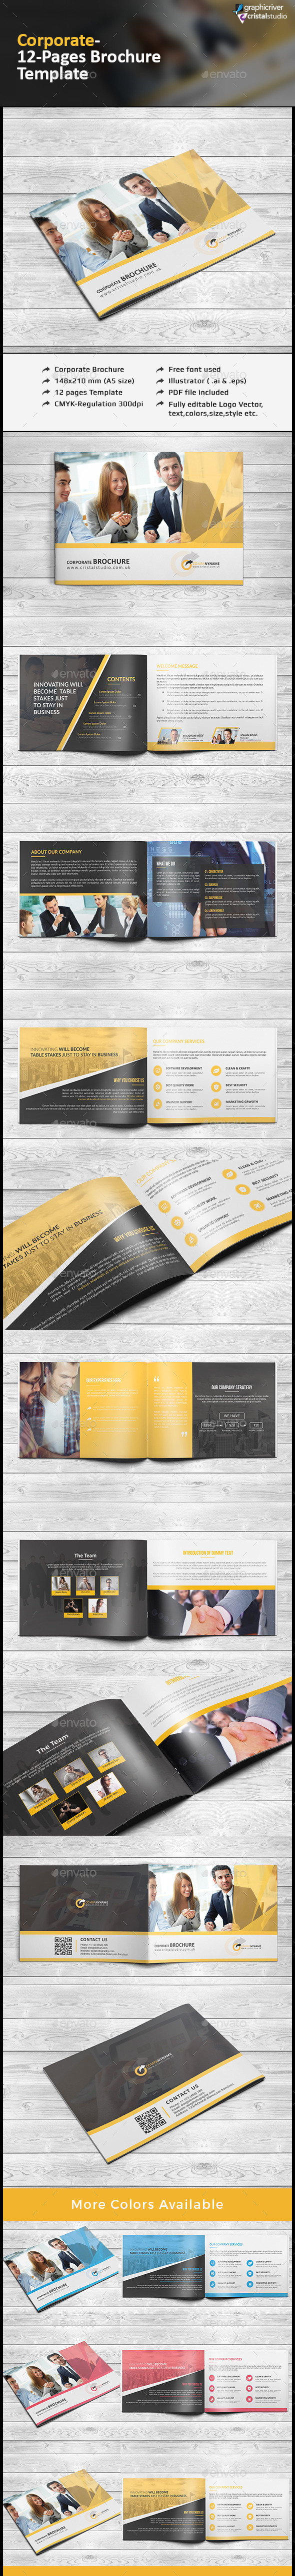 A5 Business Brochure/Catalog - Corporate Brochures